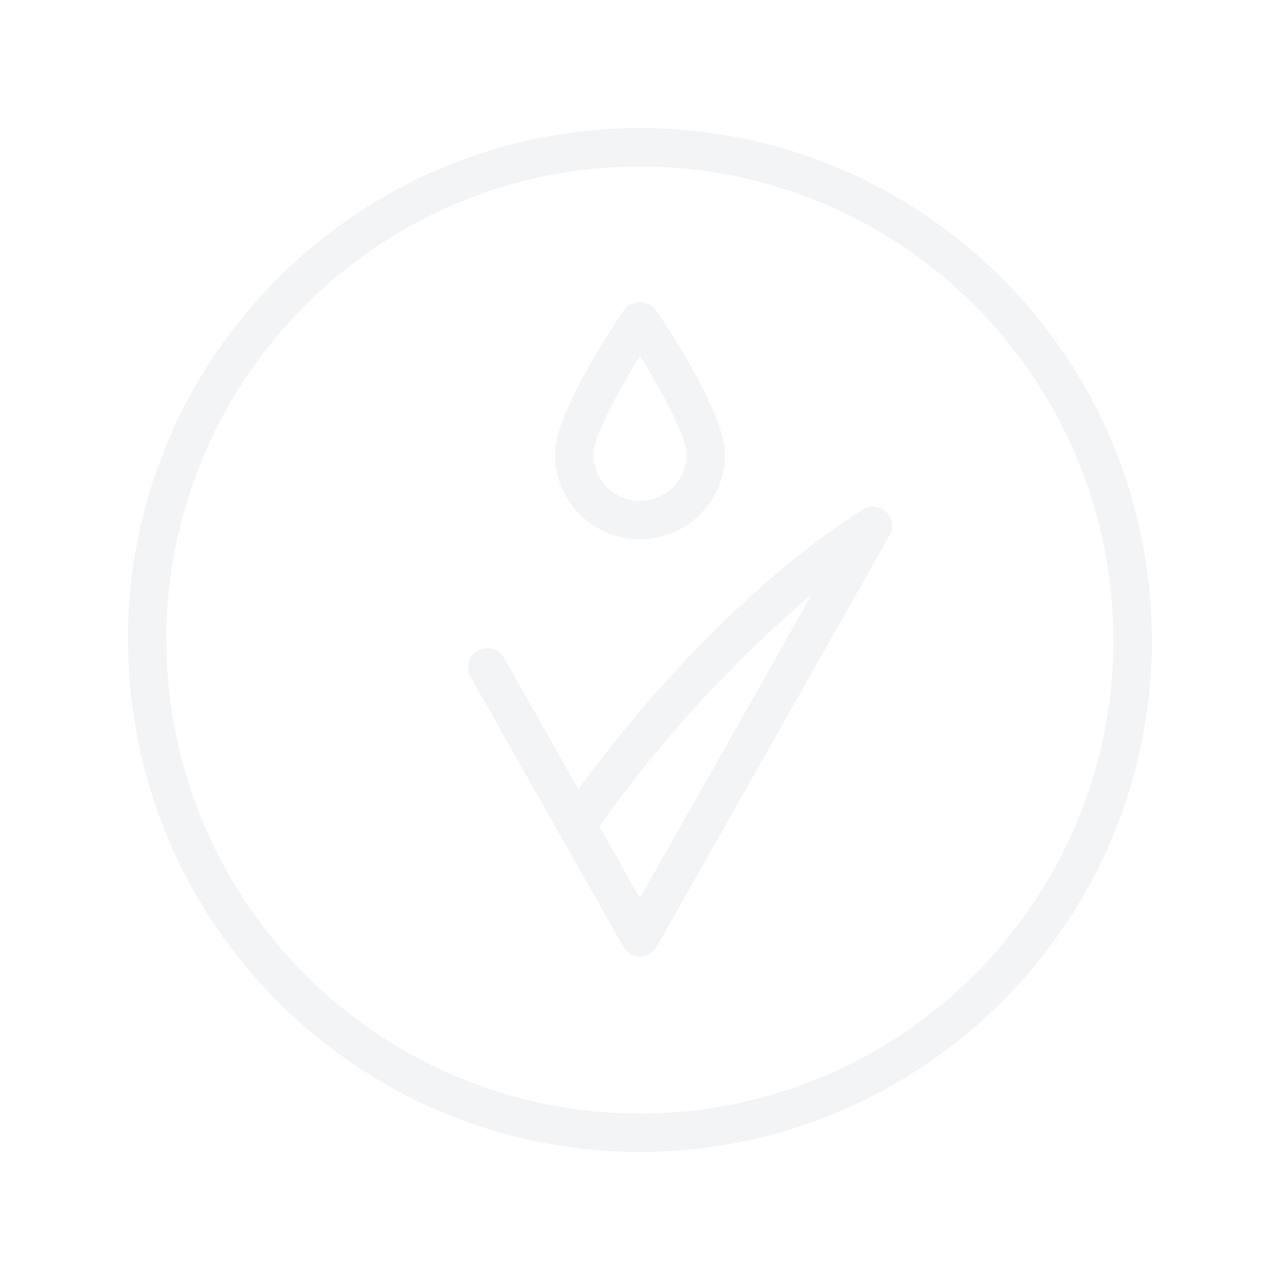 MIZON Correct Vita Oil Cushion SPF50 15g